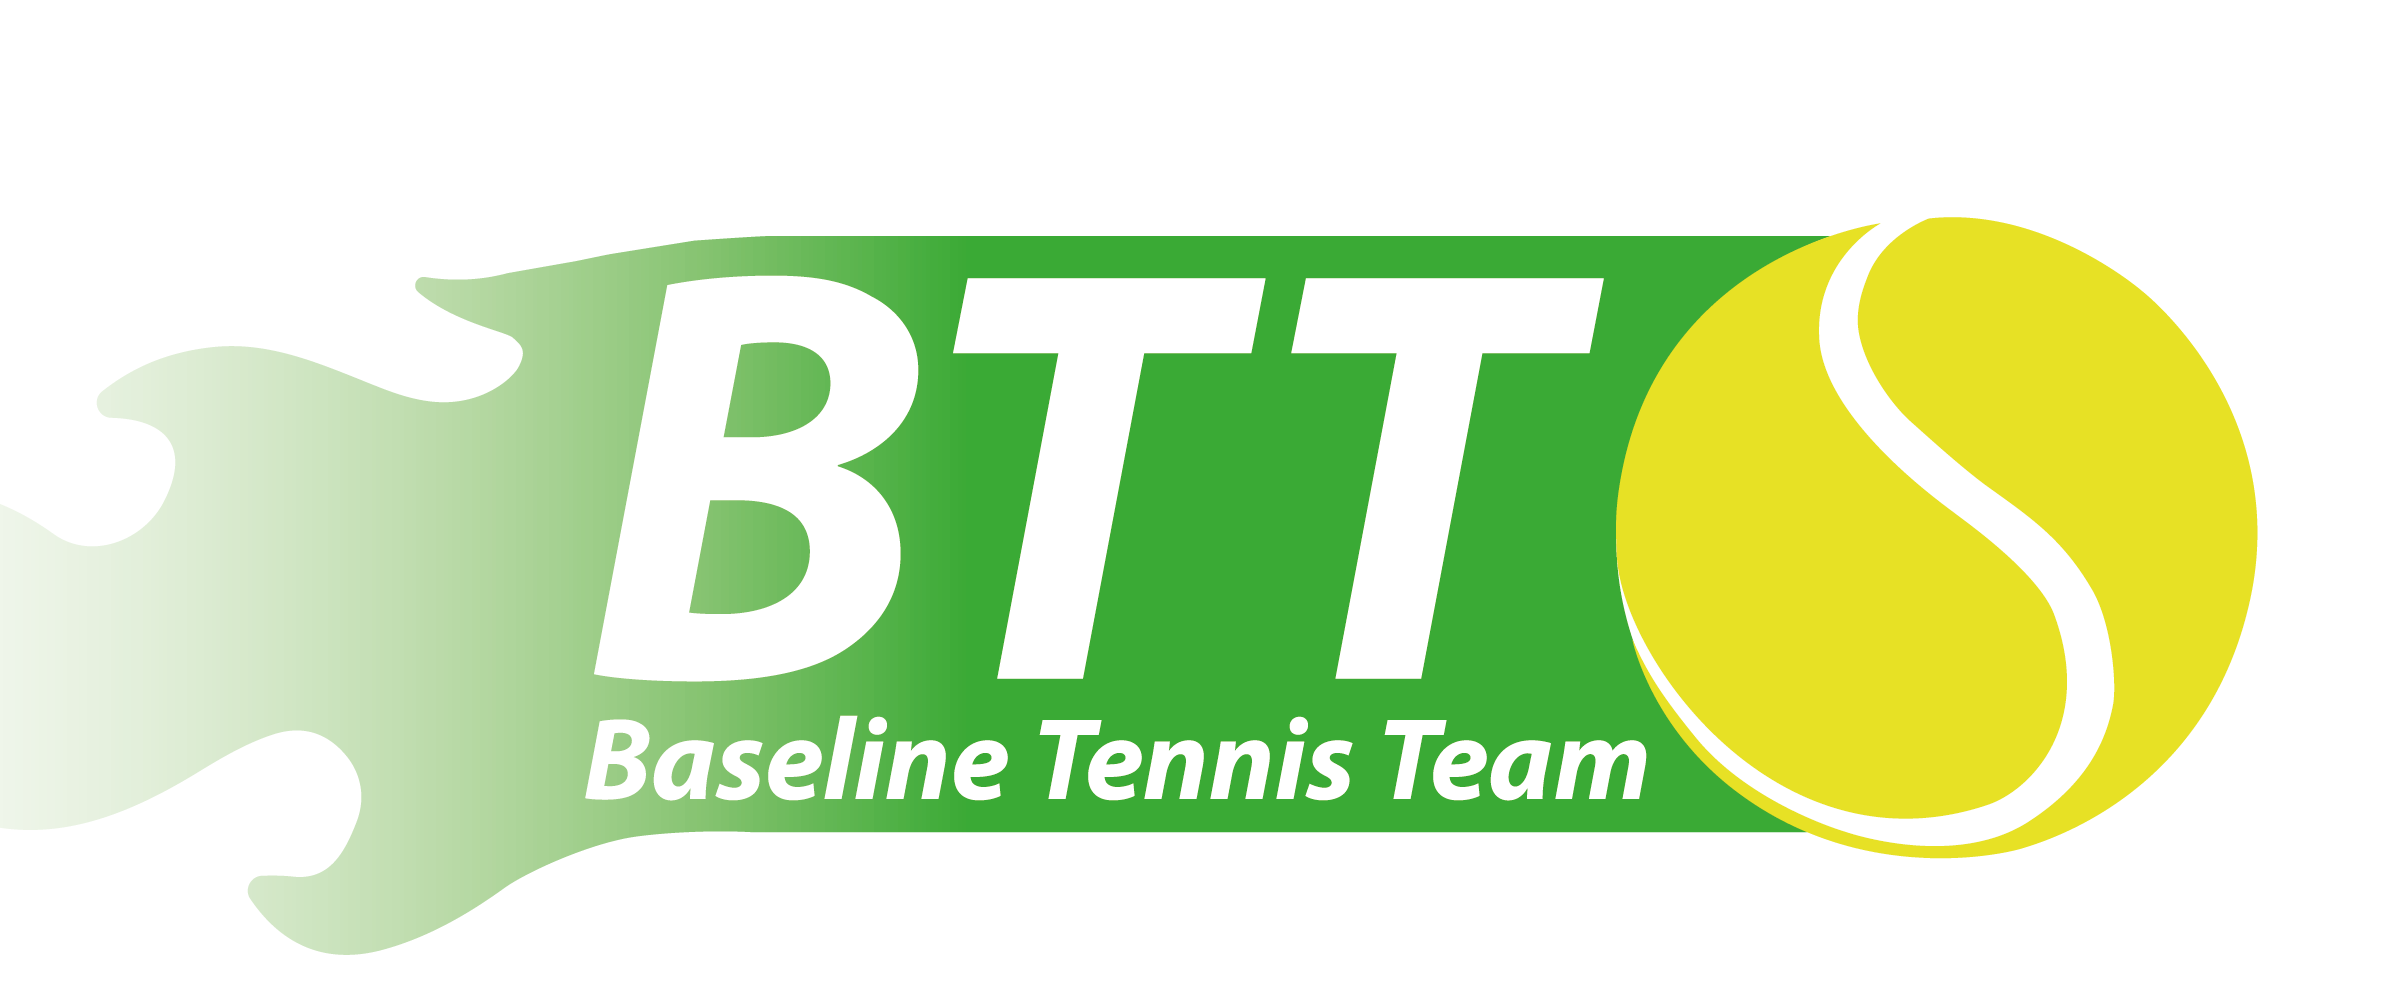 Baseline Tennis Team